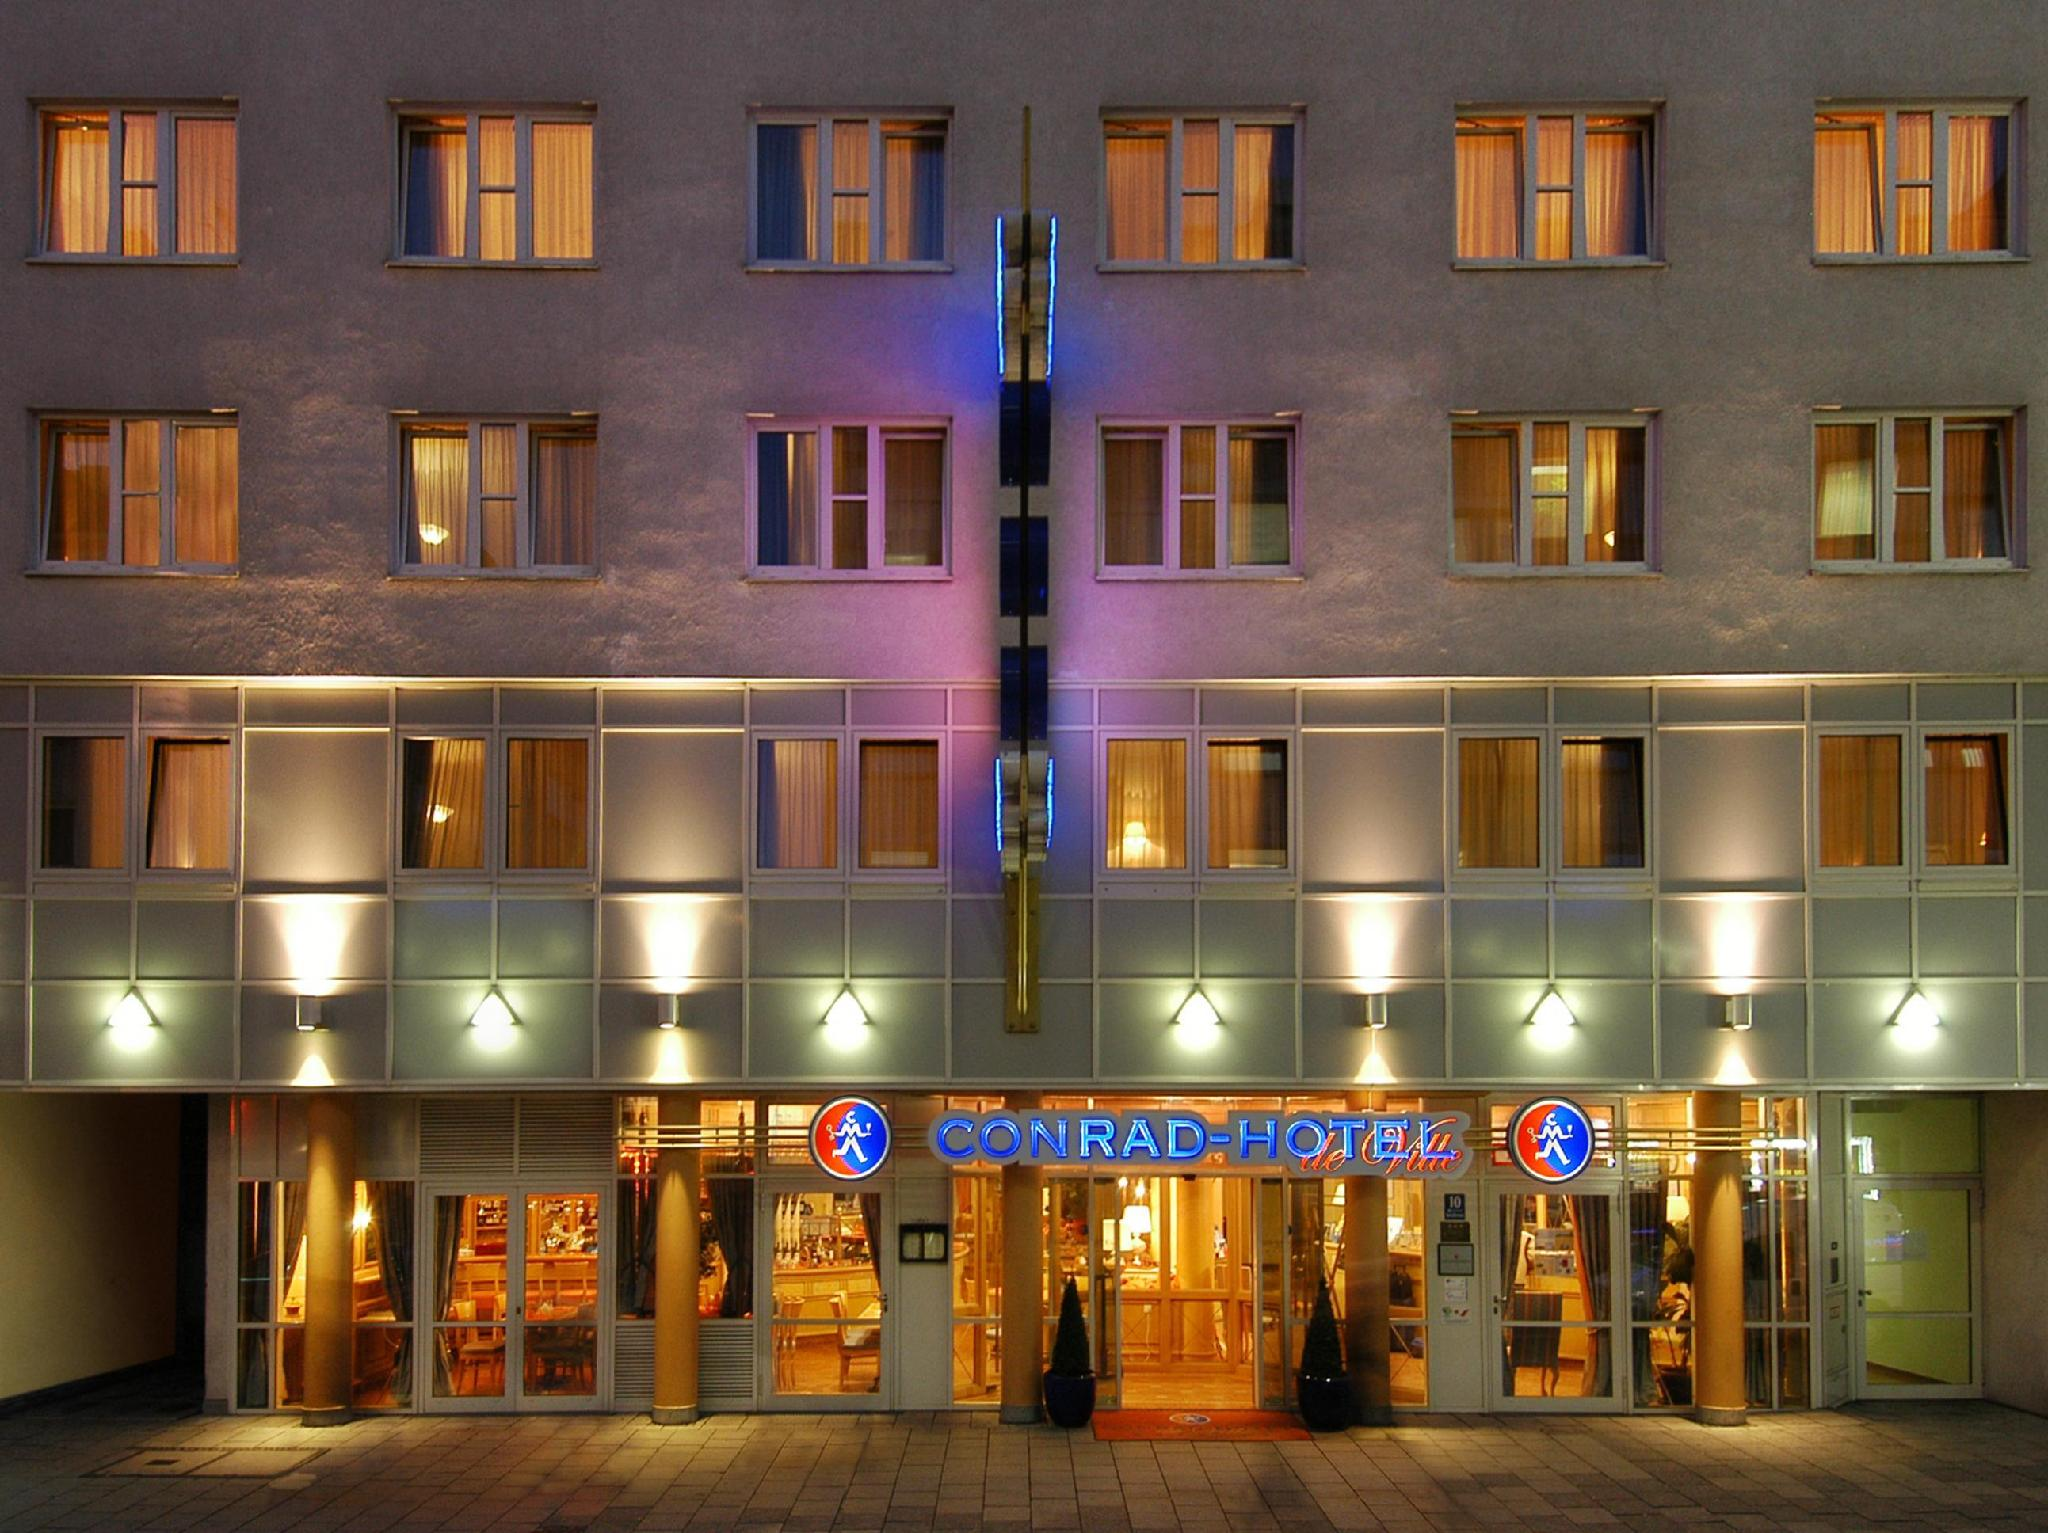 CONRAD-HOTEL de Ville MÜNCHEN in Munich - Room Deals, Photos & Reviews